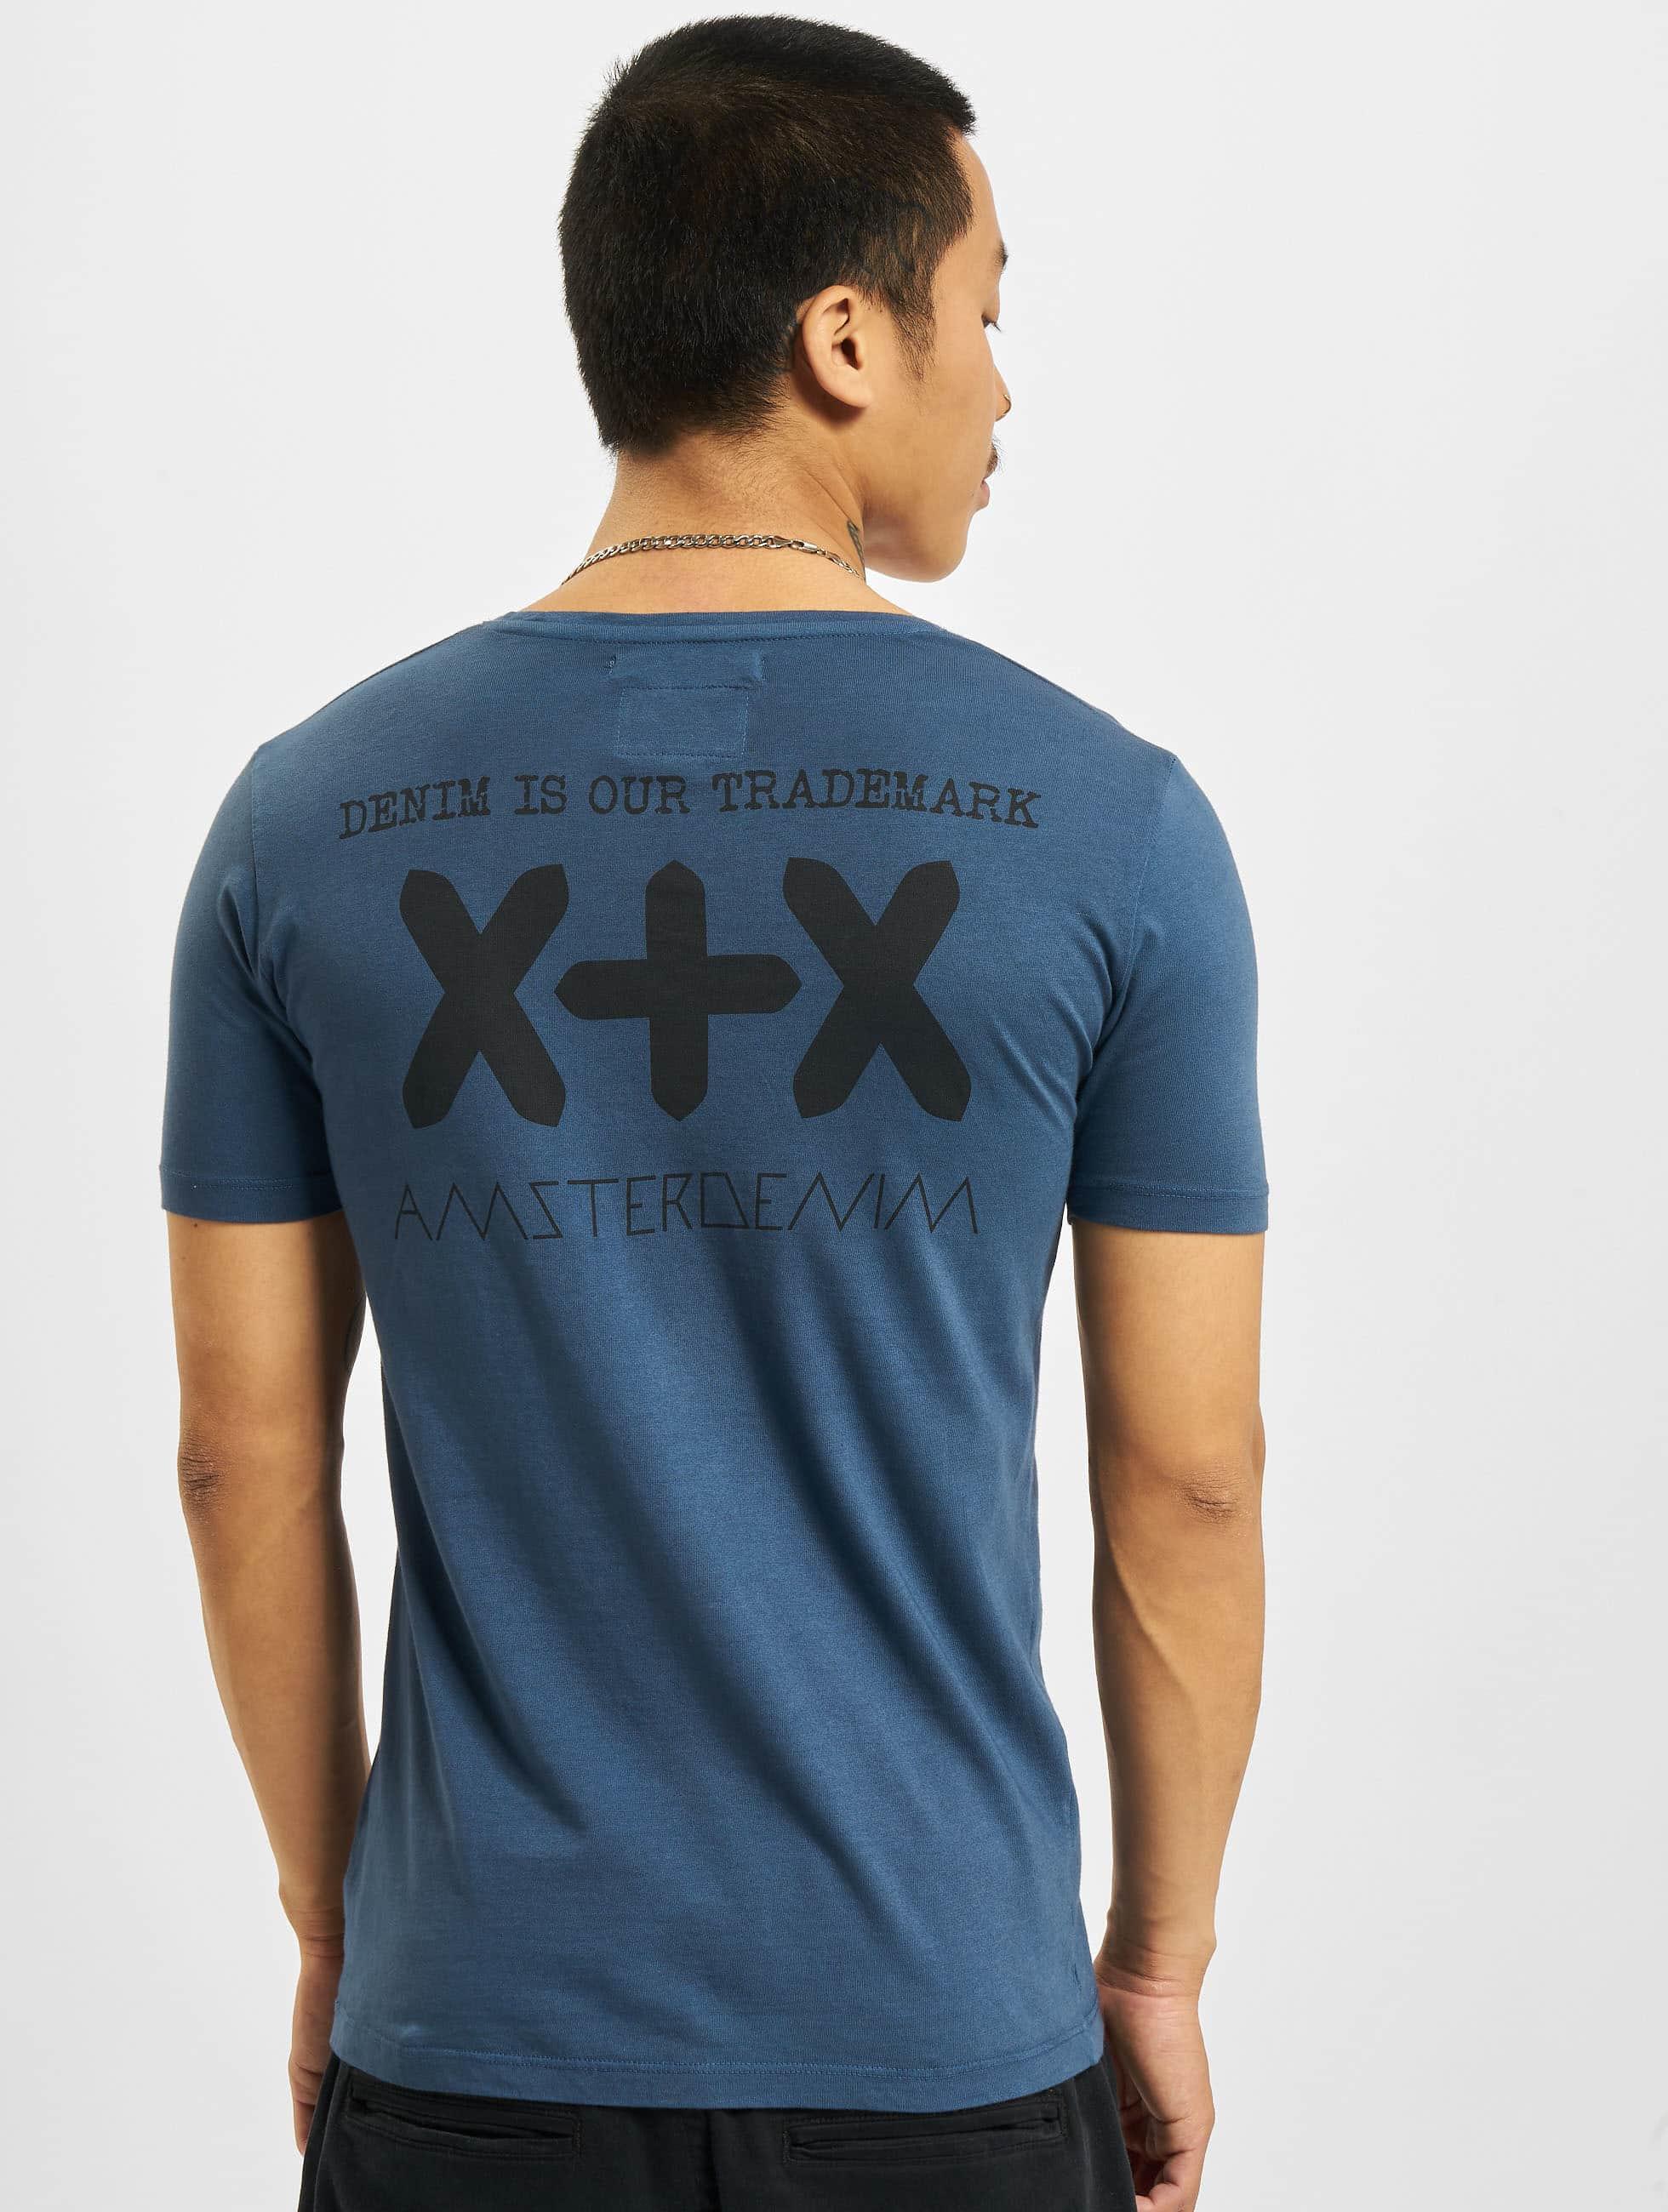 Amsterdenim T-Shirt Vin blau